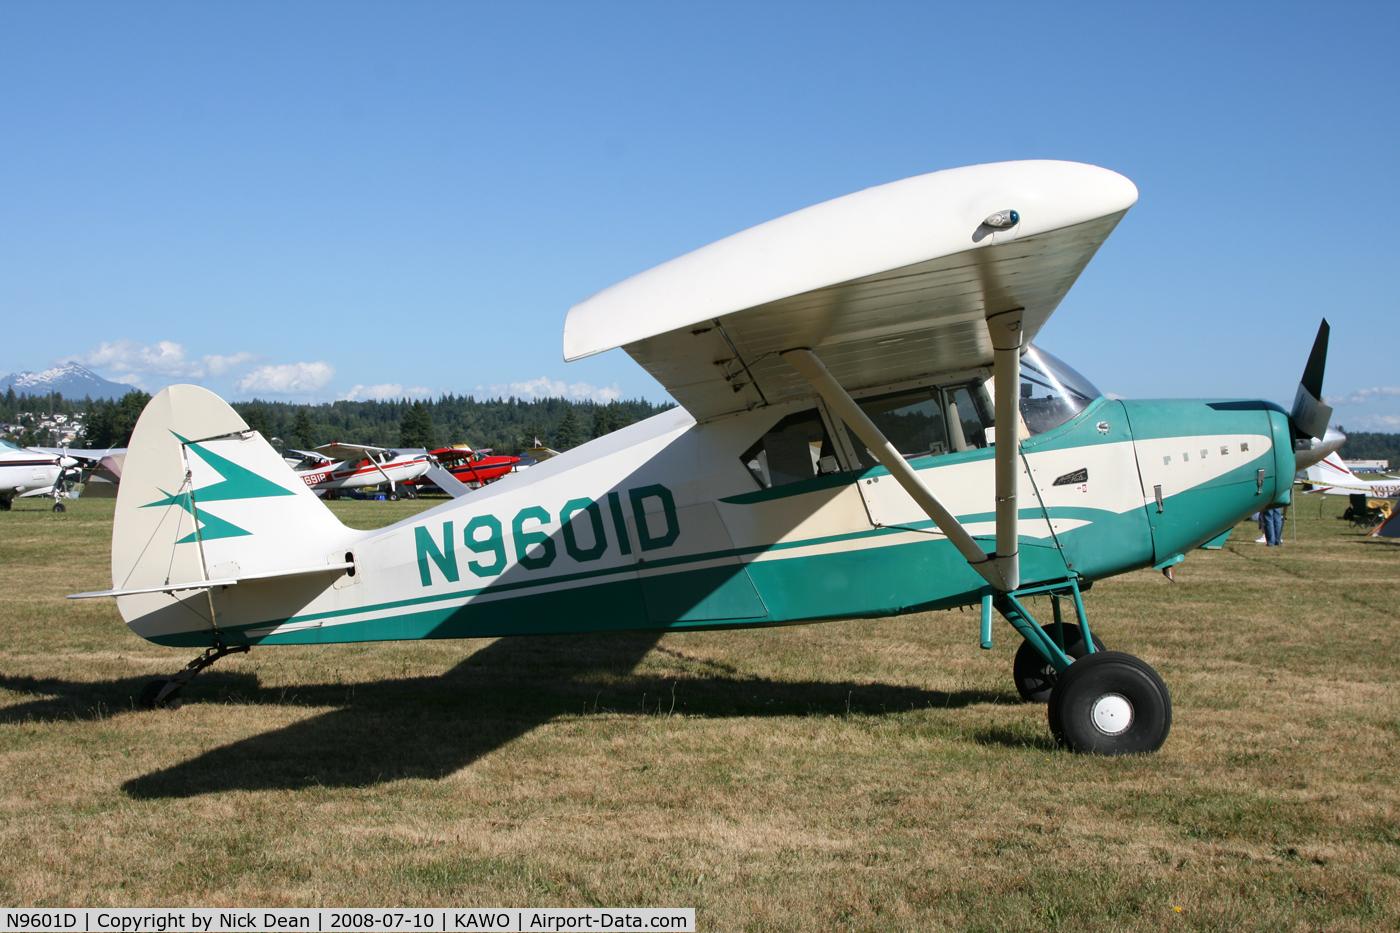 N9601D, 1958 Piper PA-22-160 Tri Pacer C/N 22-6510, .